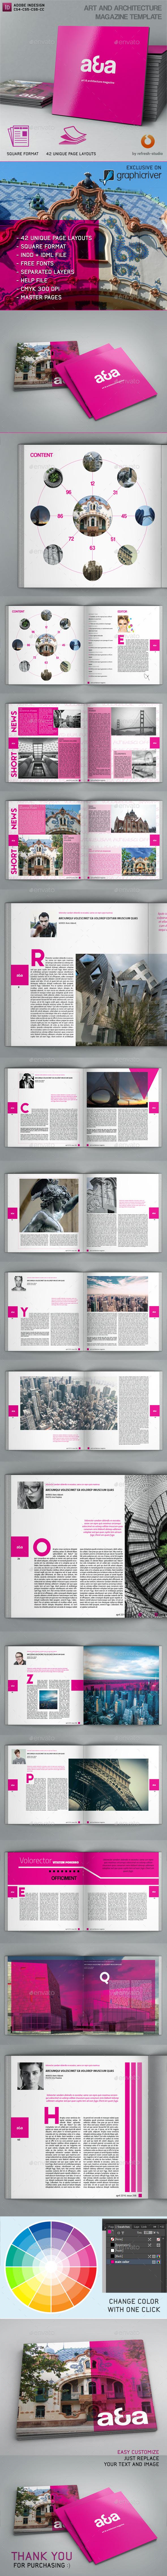 Art and Architecture Magazine - Magazines Print Templates